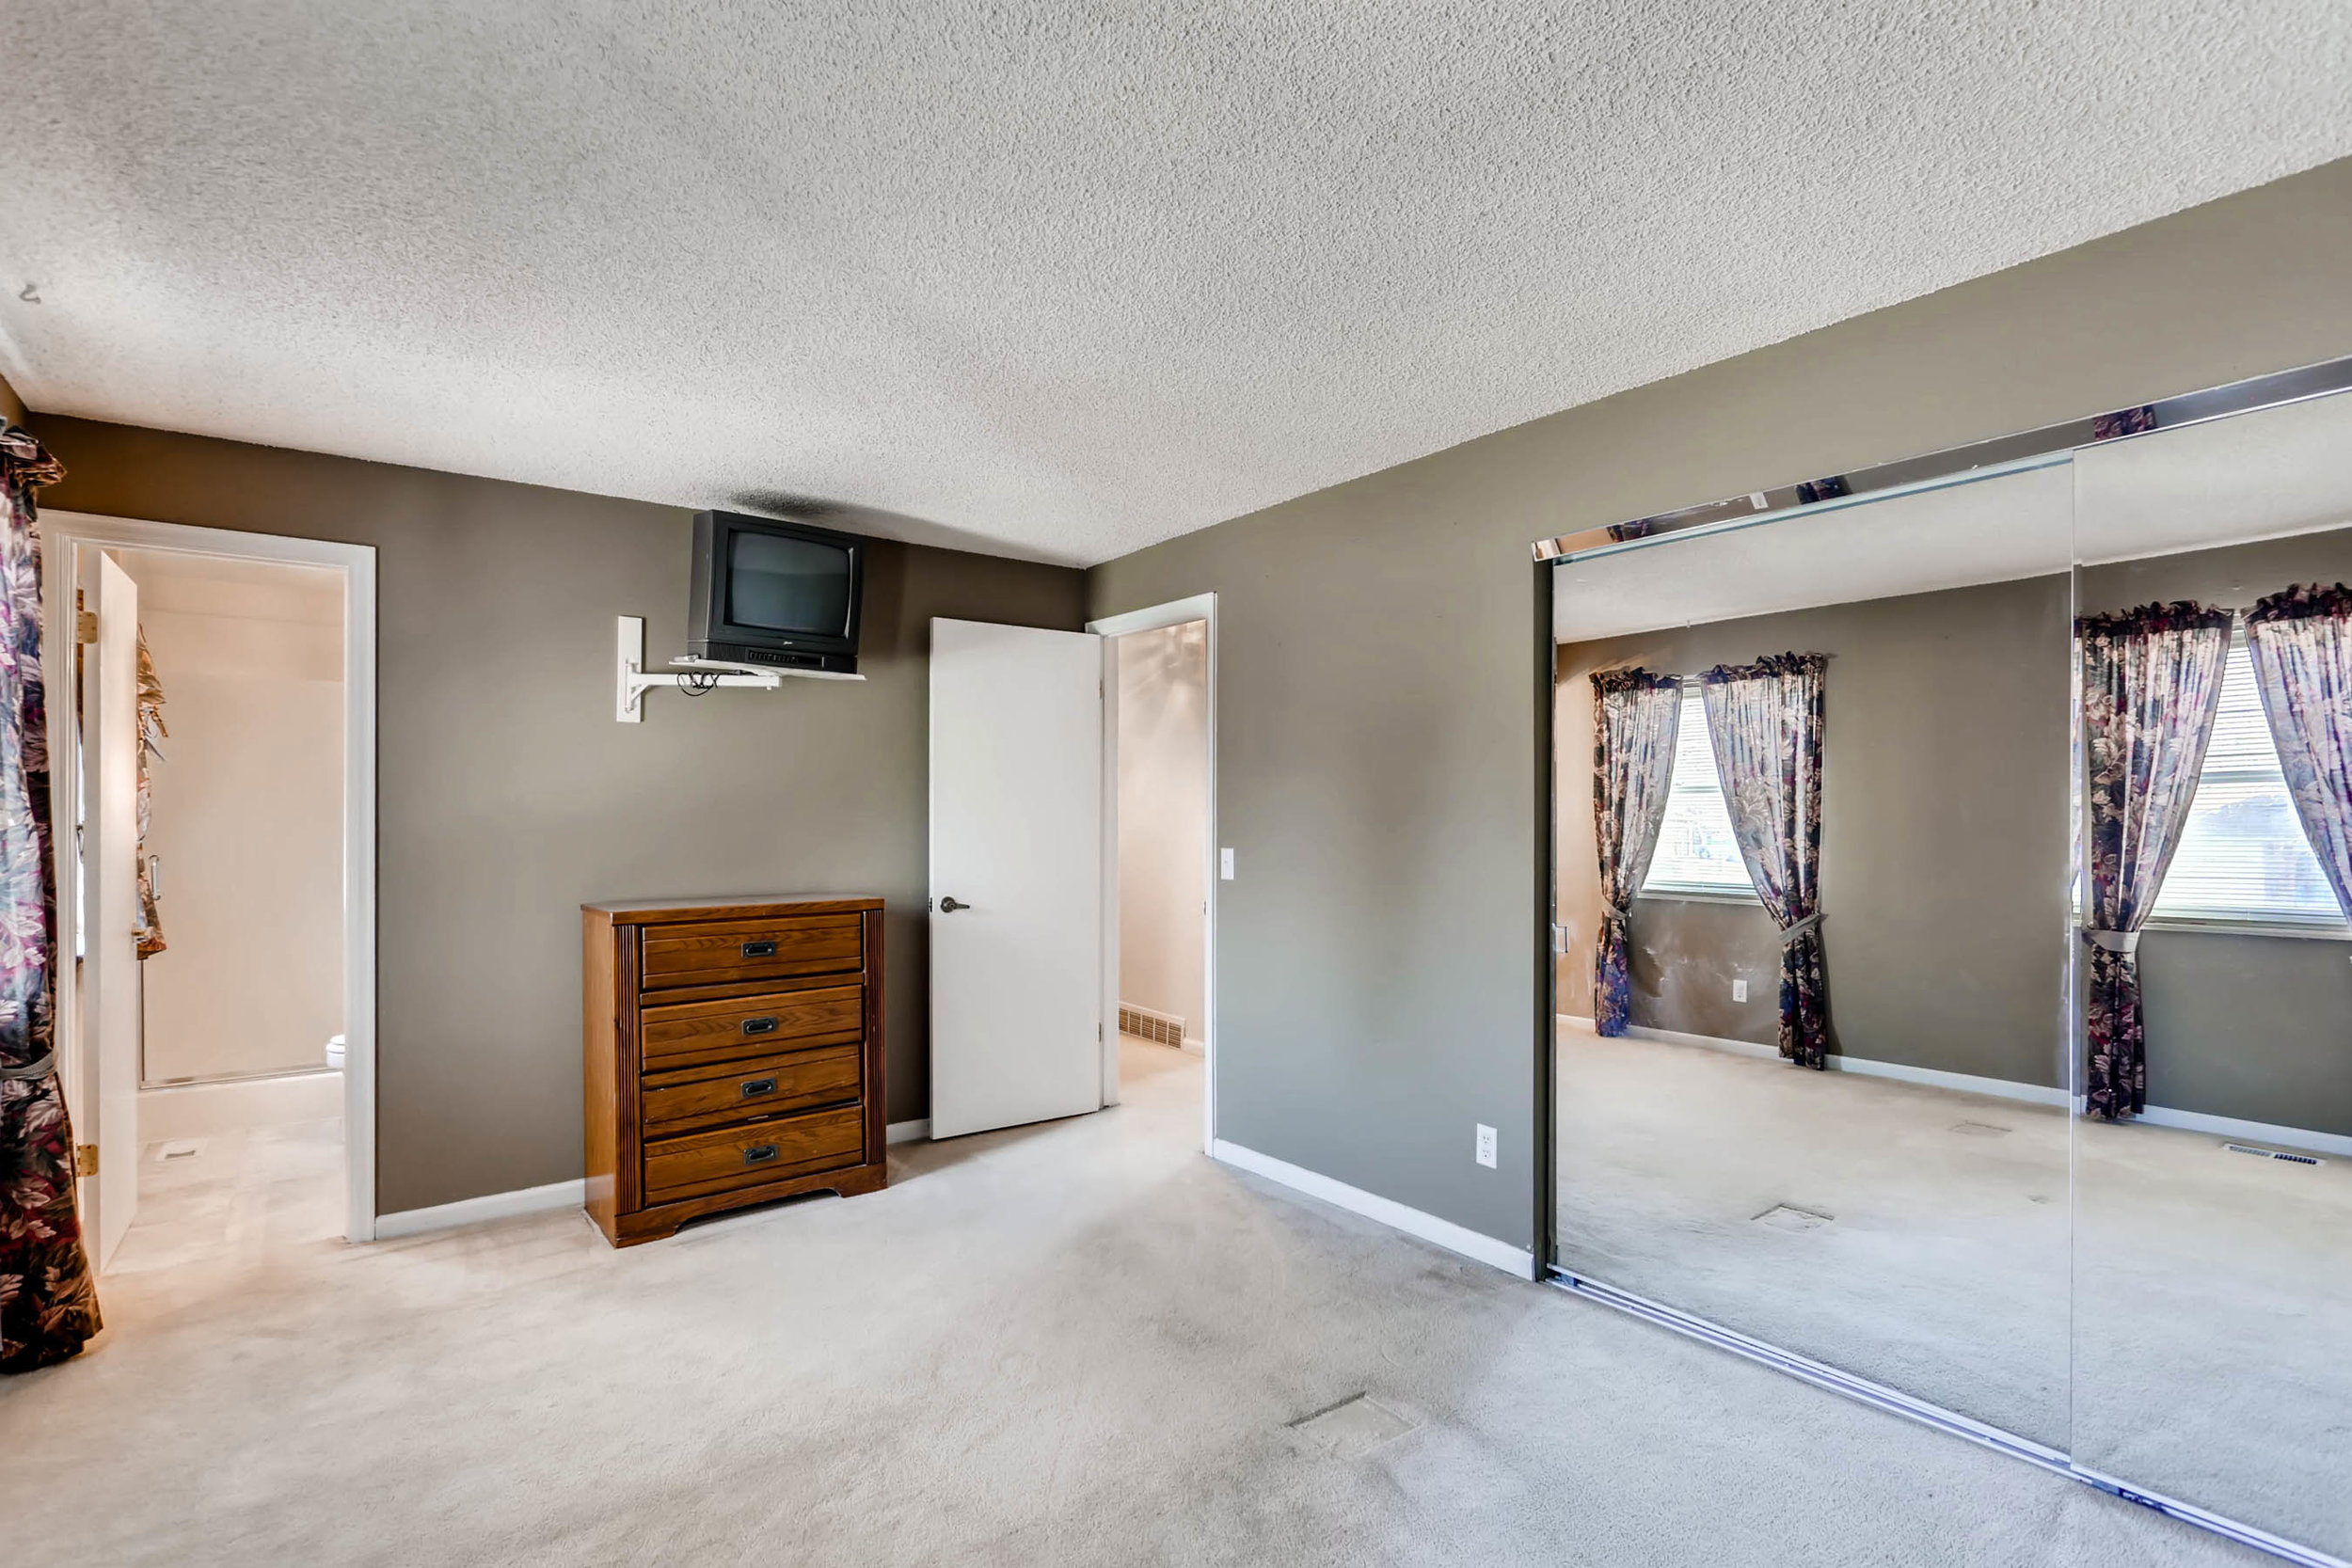 15001 E Gunnison Place Aurora-print-019-22-2nd Floor Master Bedroom-2700x1800-300dpi.jpg